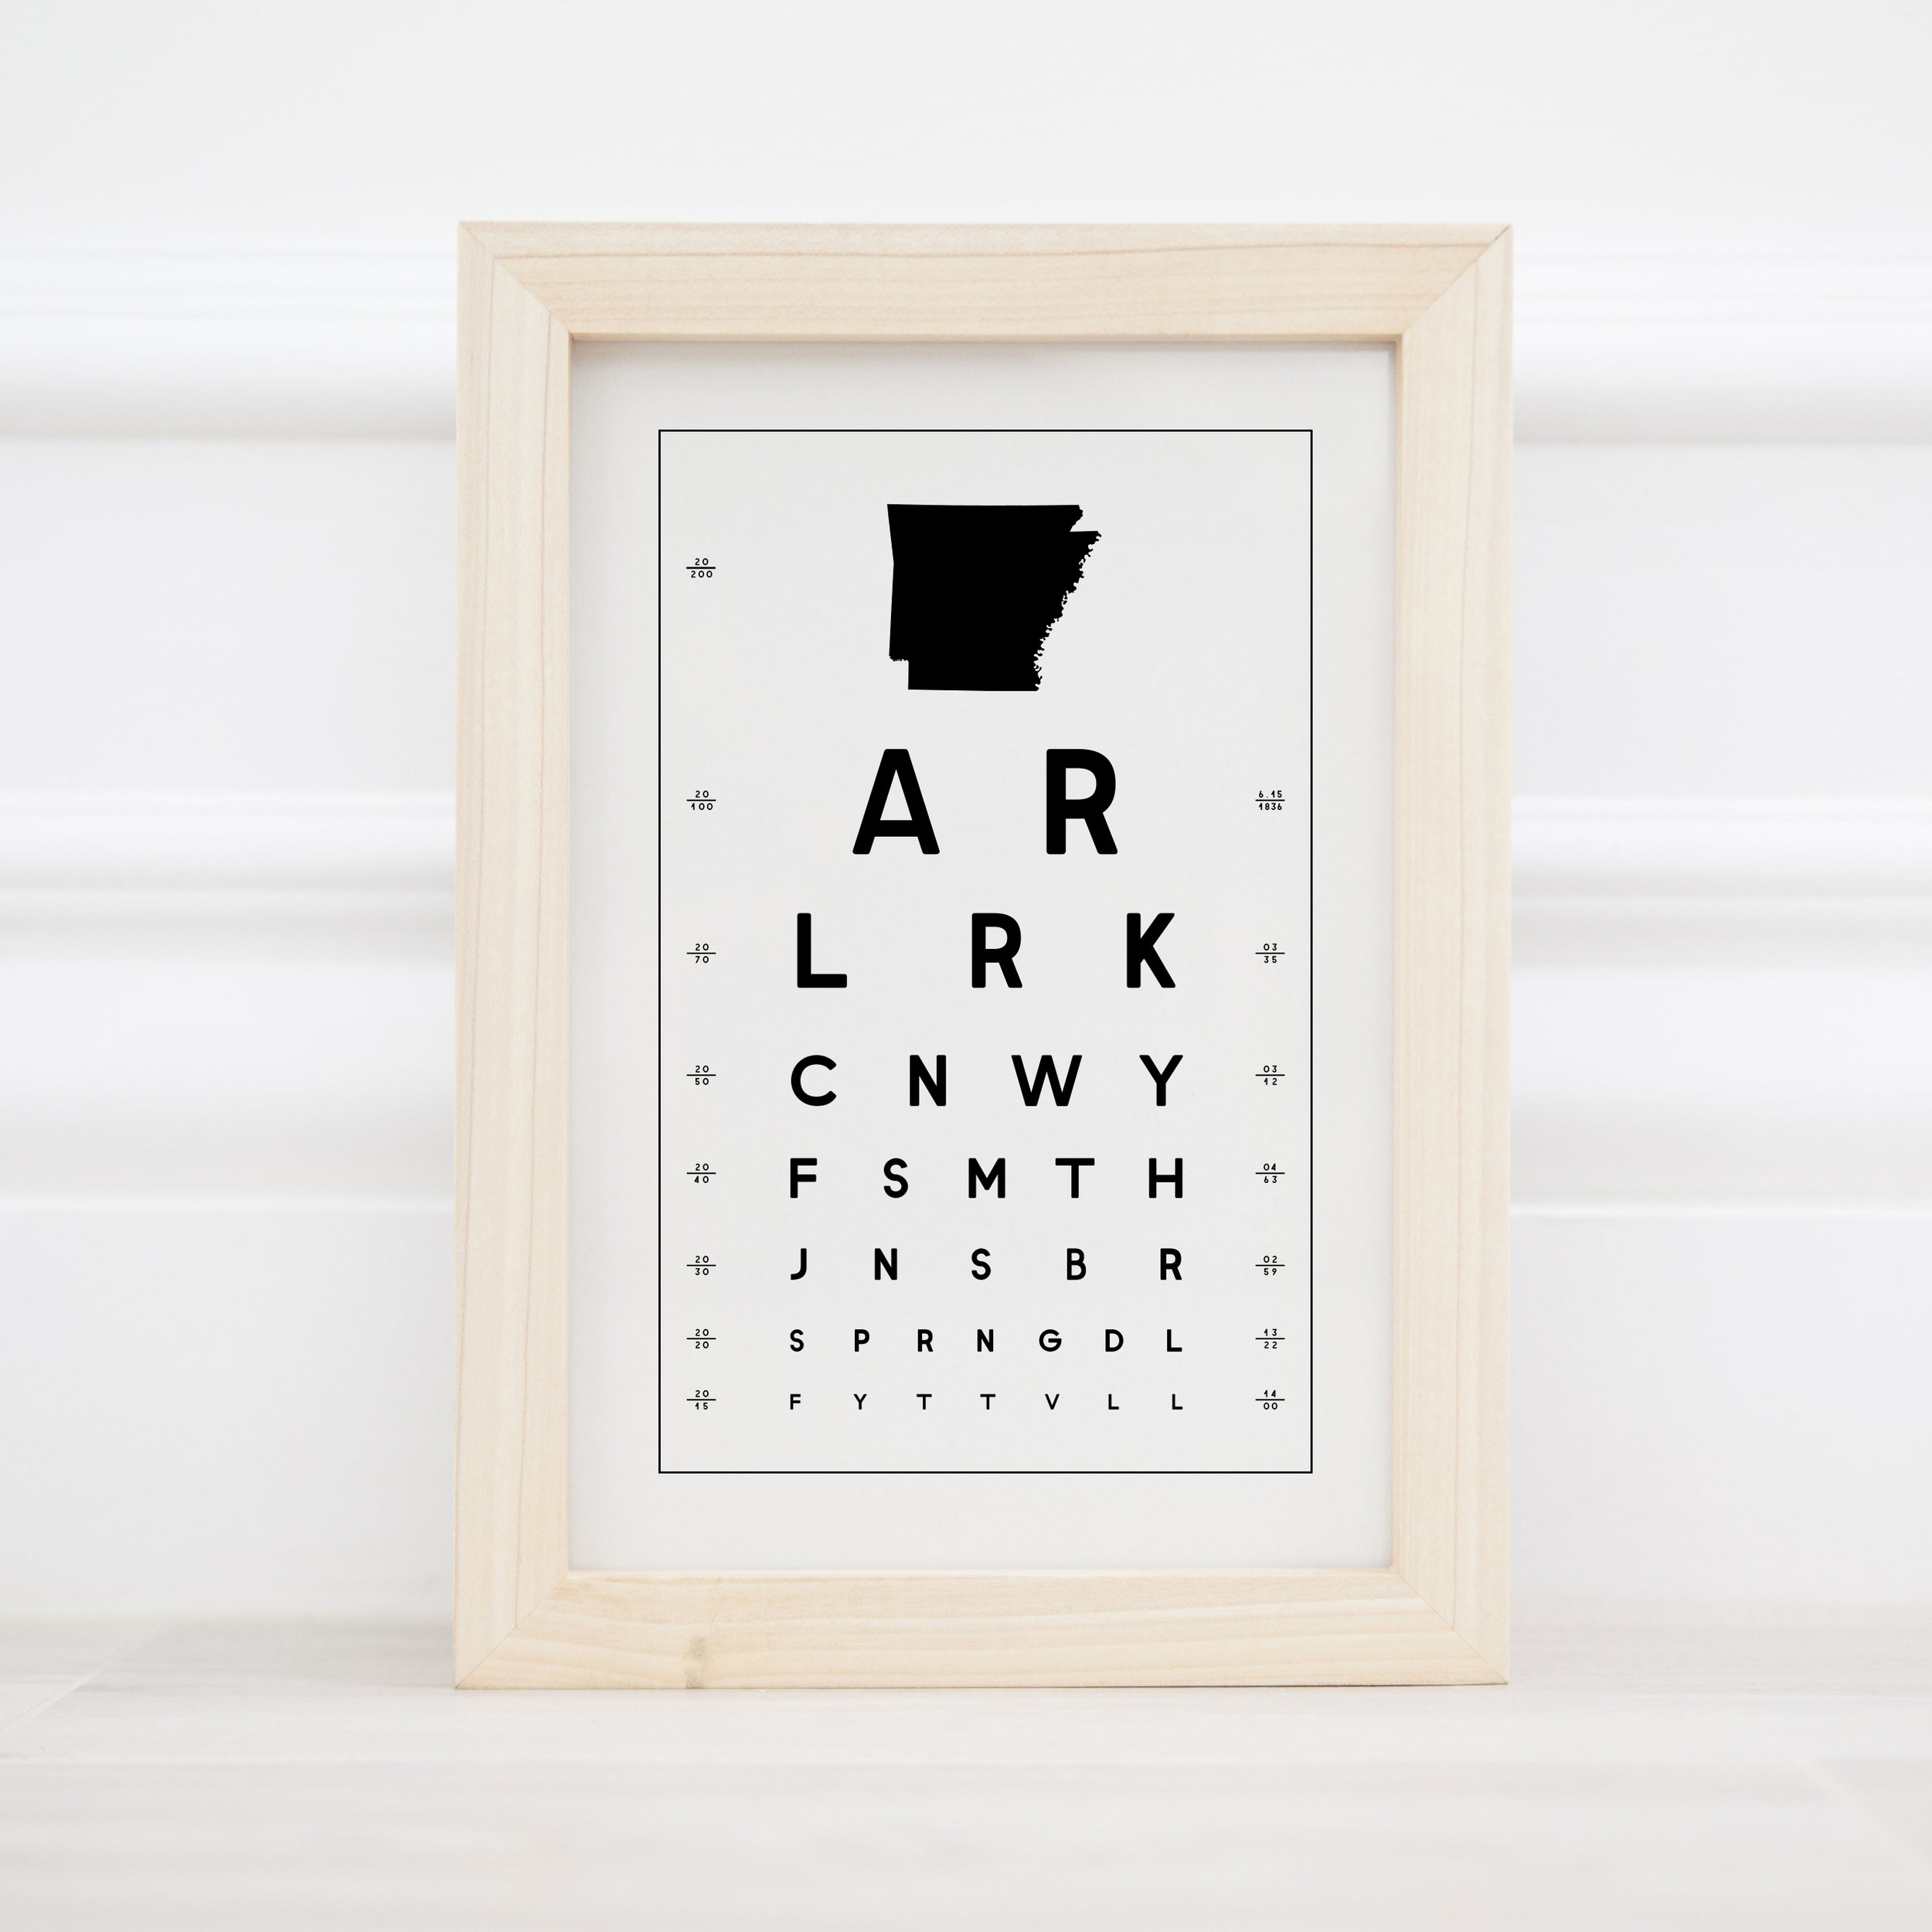 AR Framed1-1.jpg